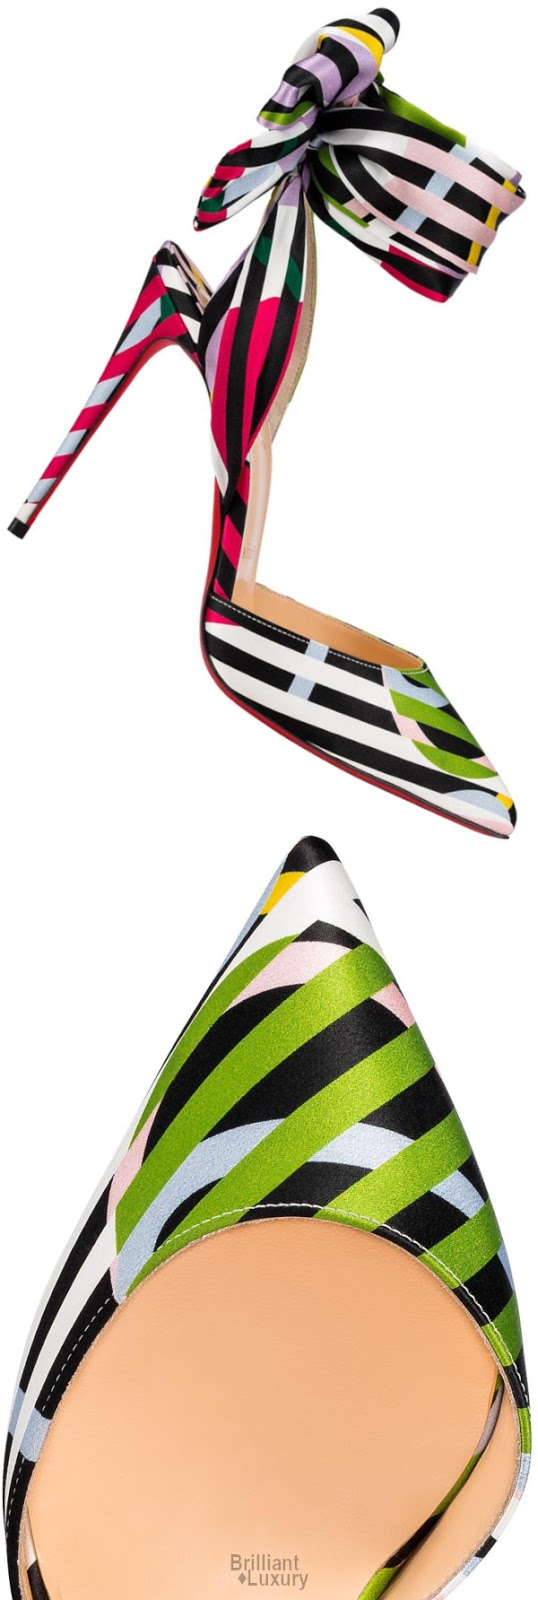 Brilliant Luxury♦Christian Louboutin Douce Du Desert Colorful Satin Crepe Cinestripes Sandals